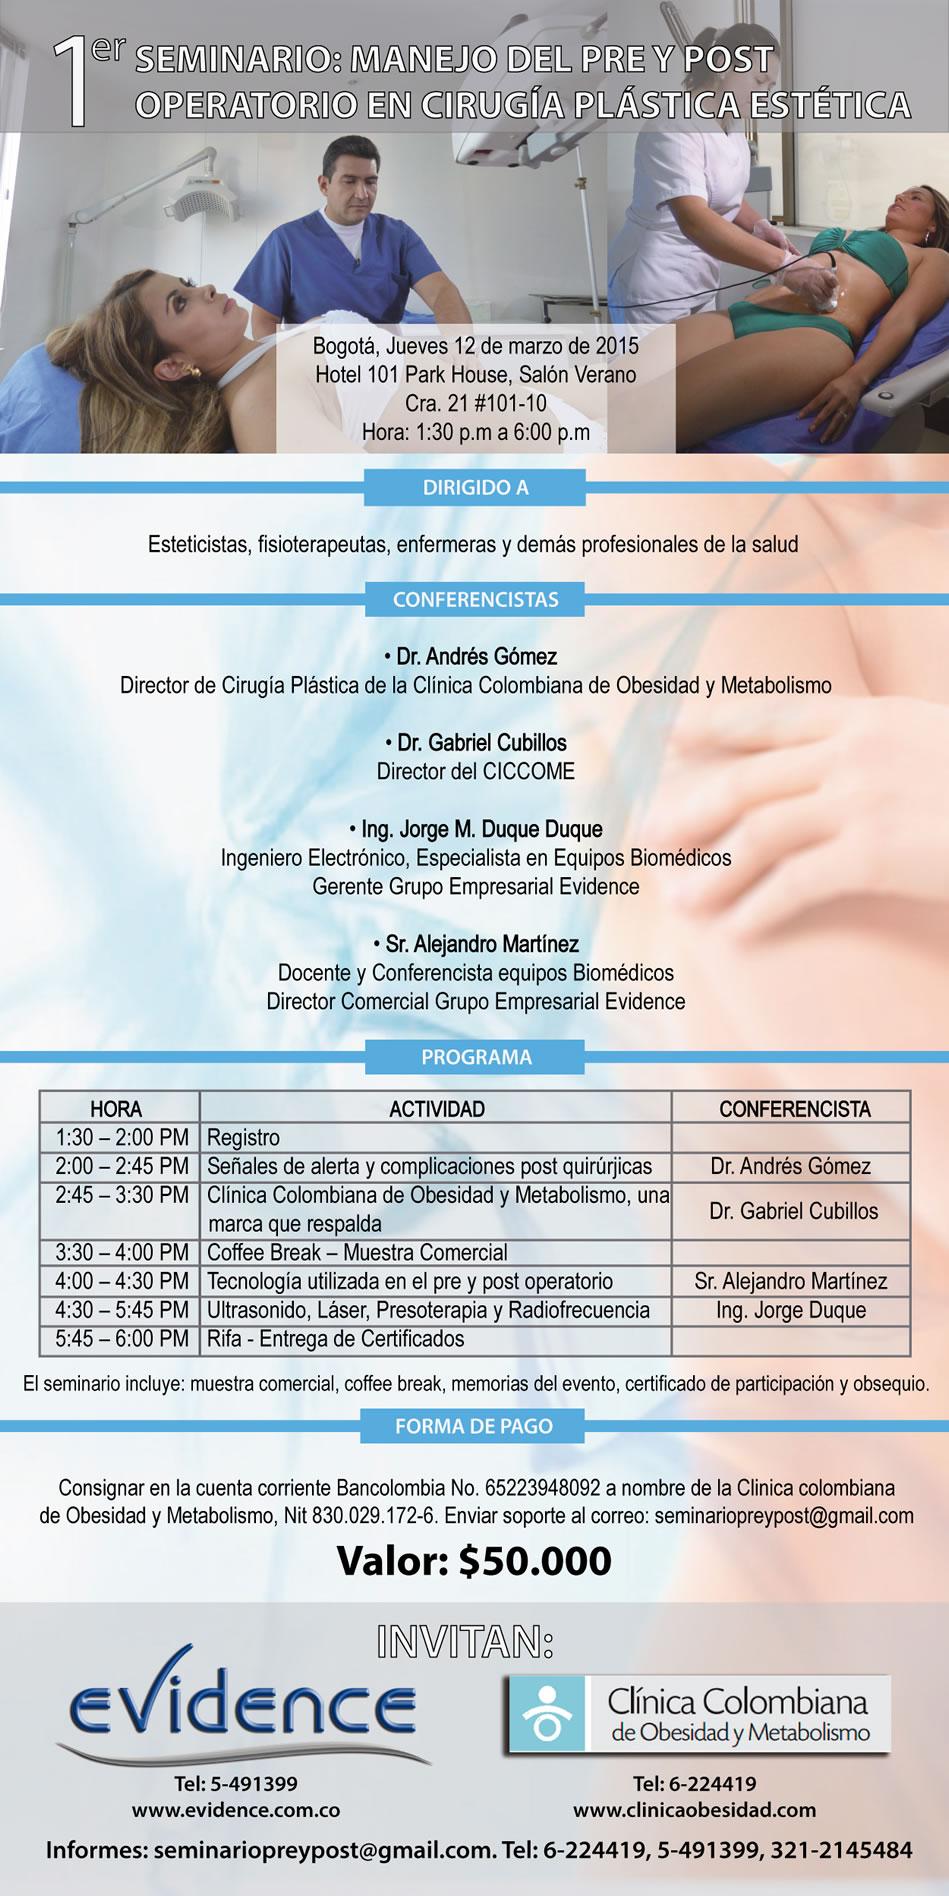 info-seminario-clinica-obesidad